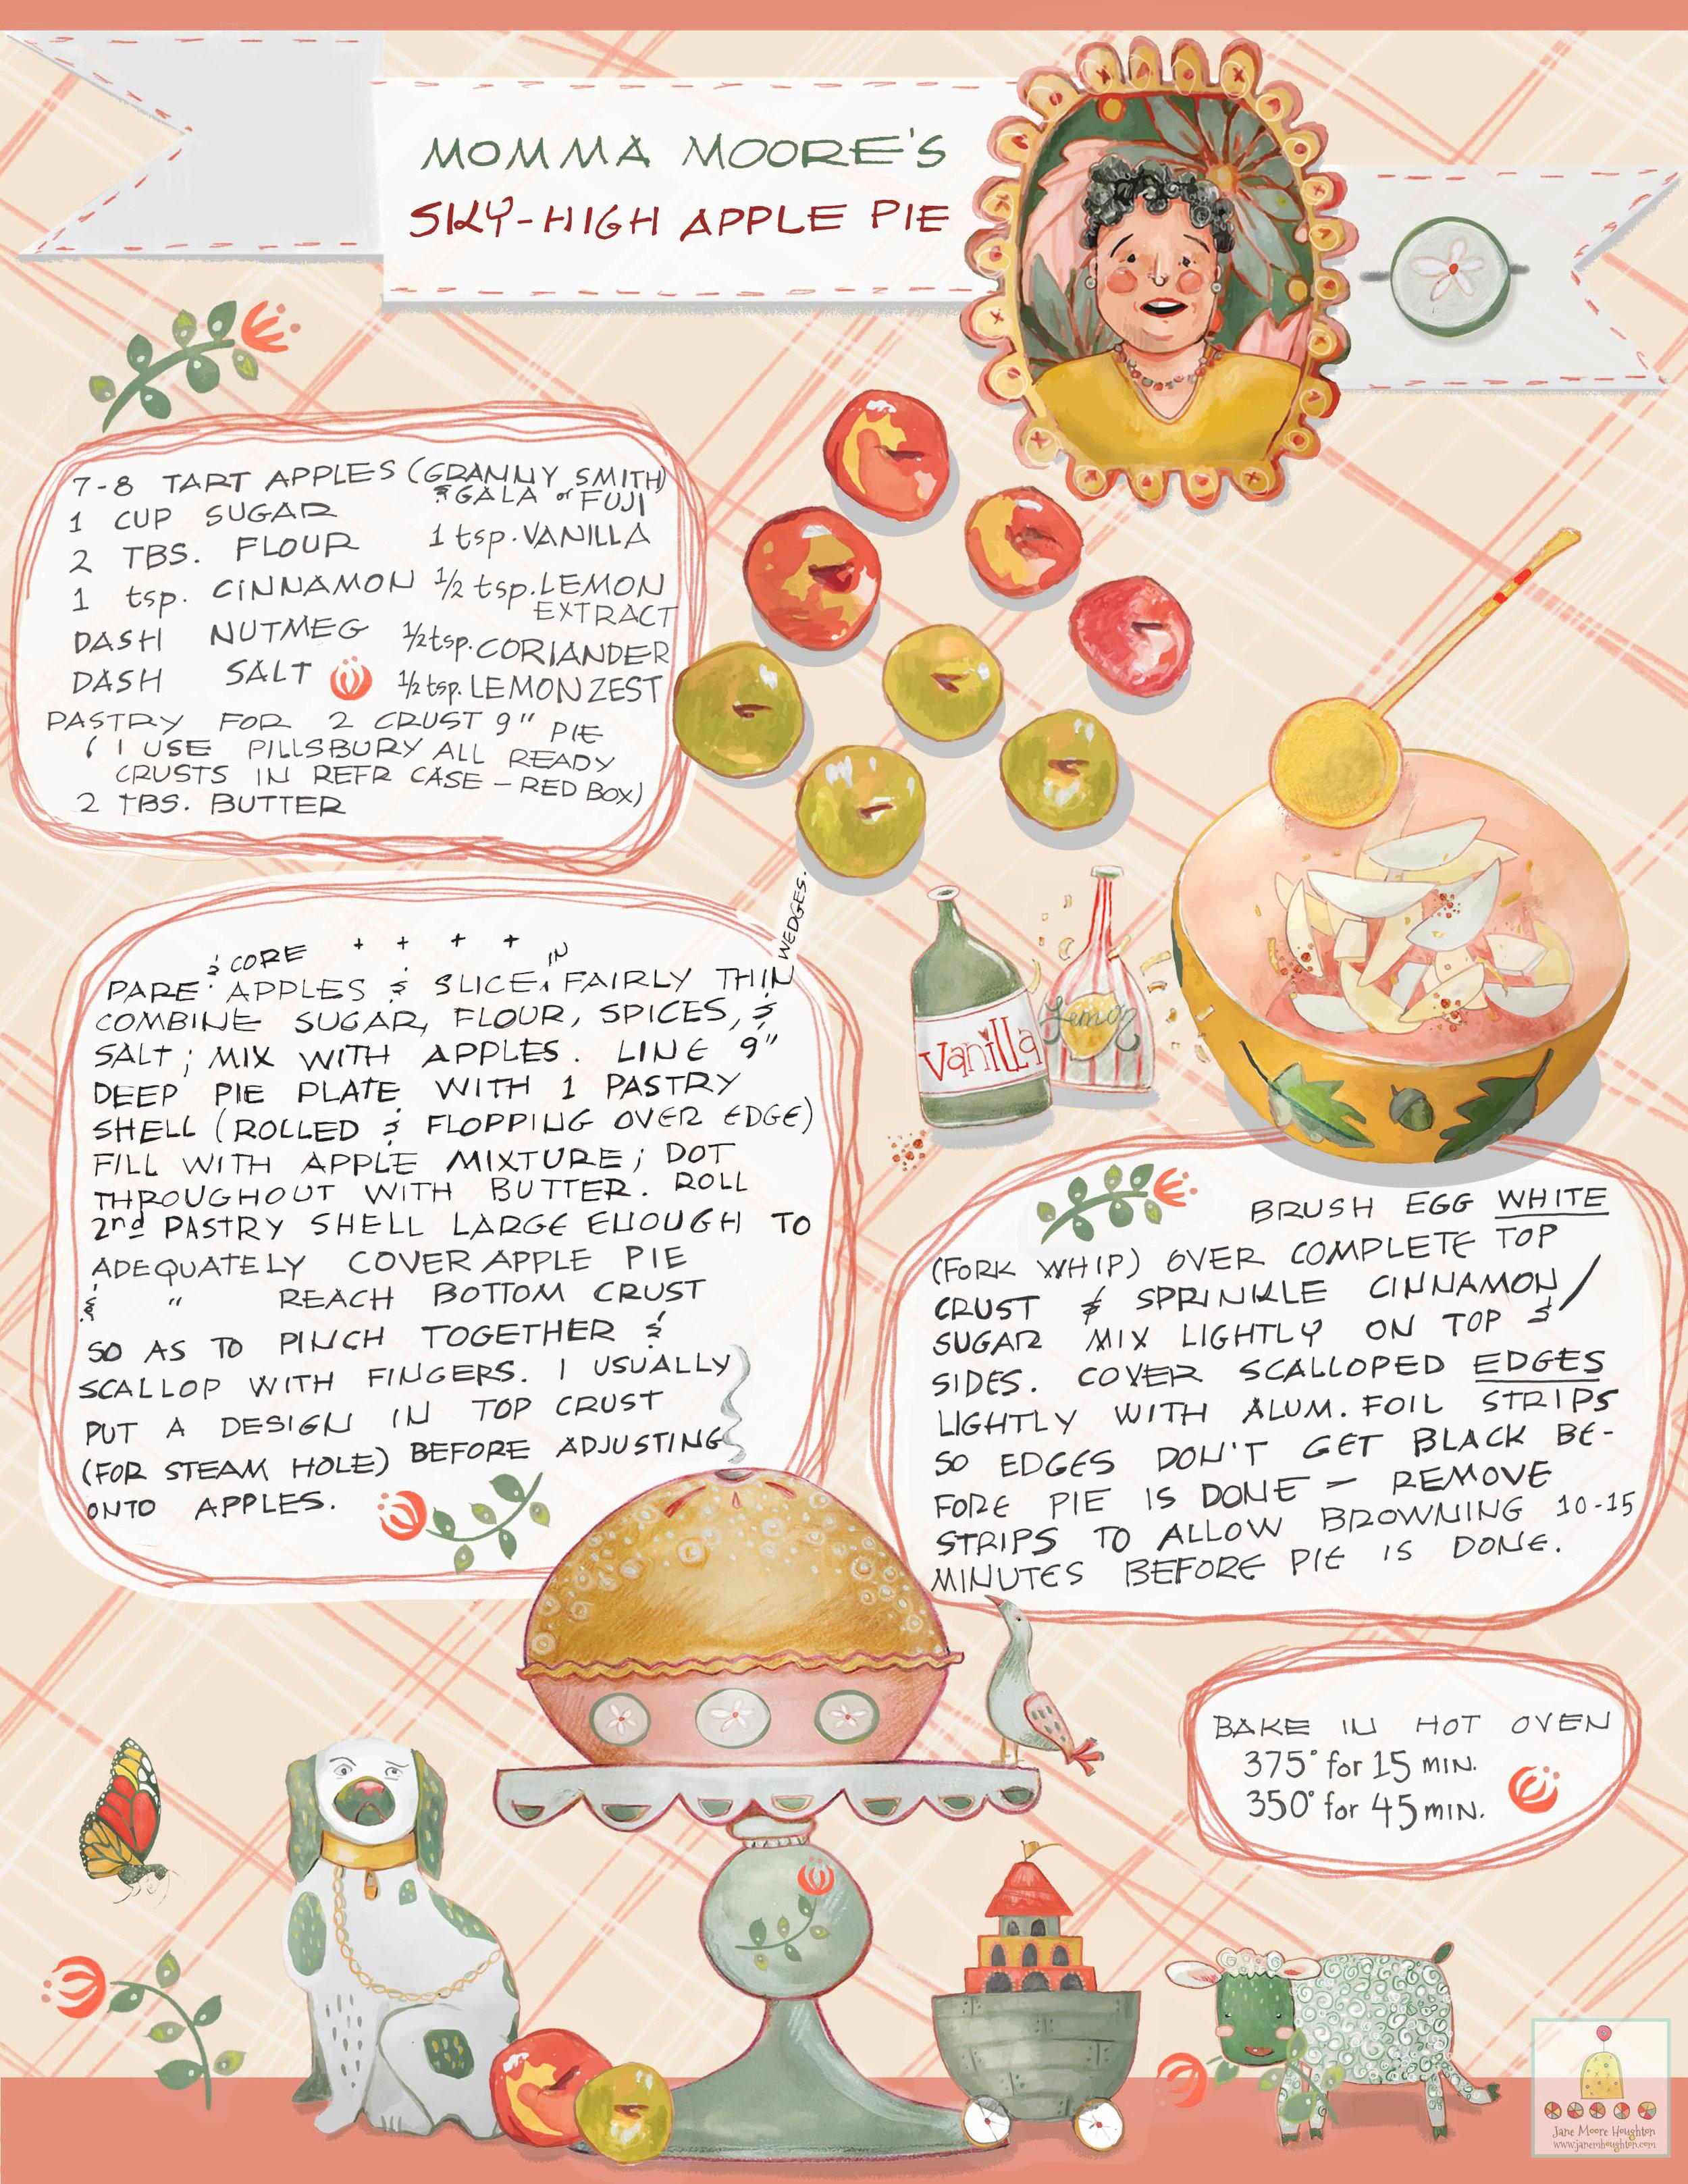 Gammy's Sky High Apple Pie Recipe.jpg